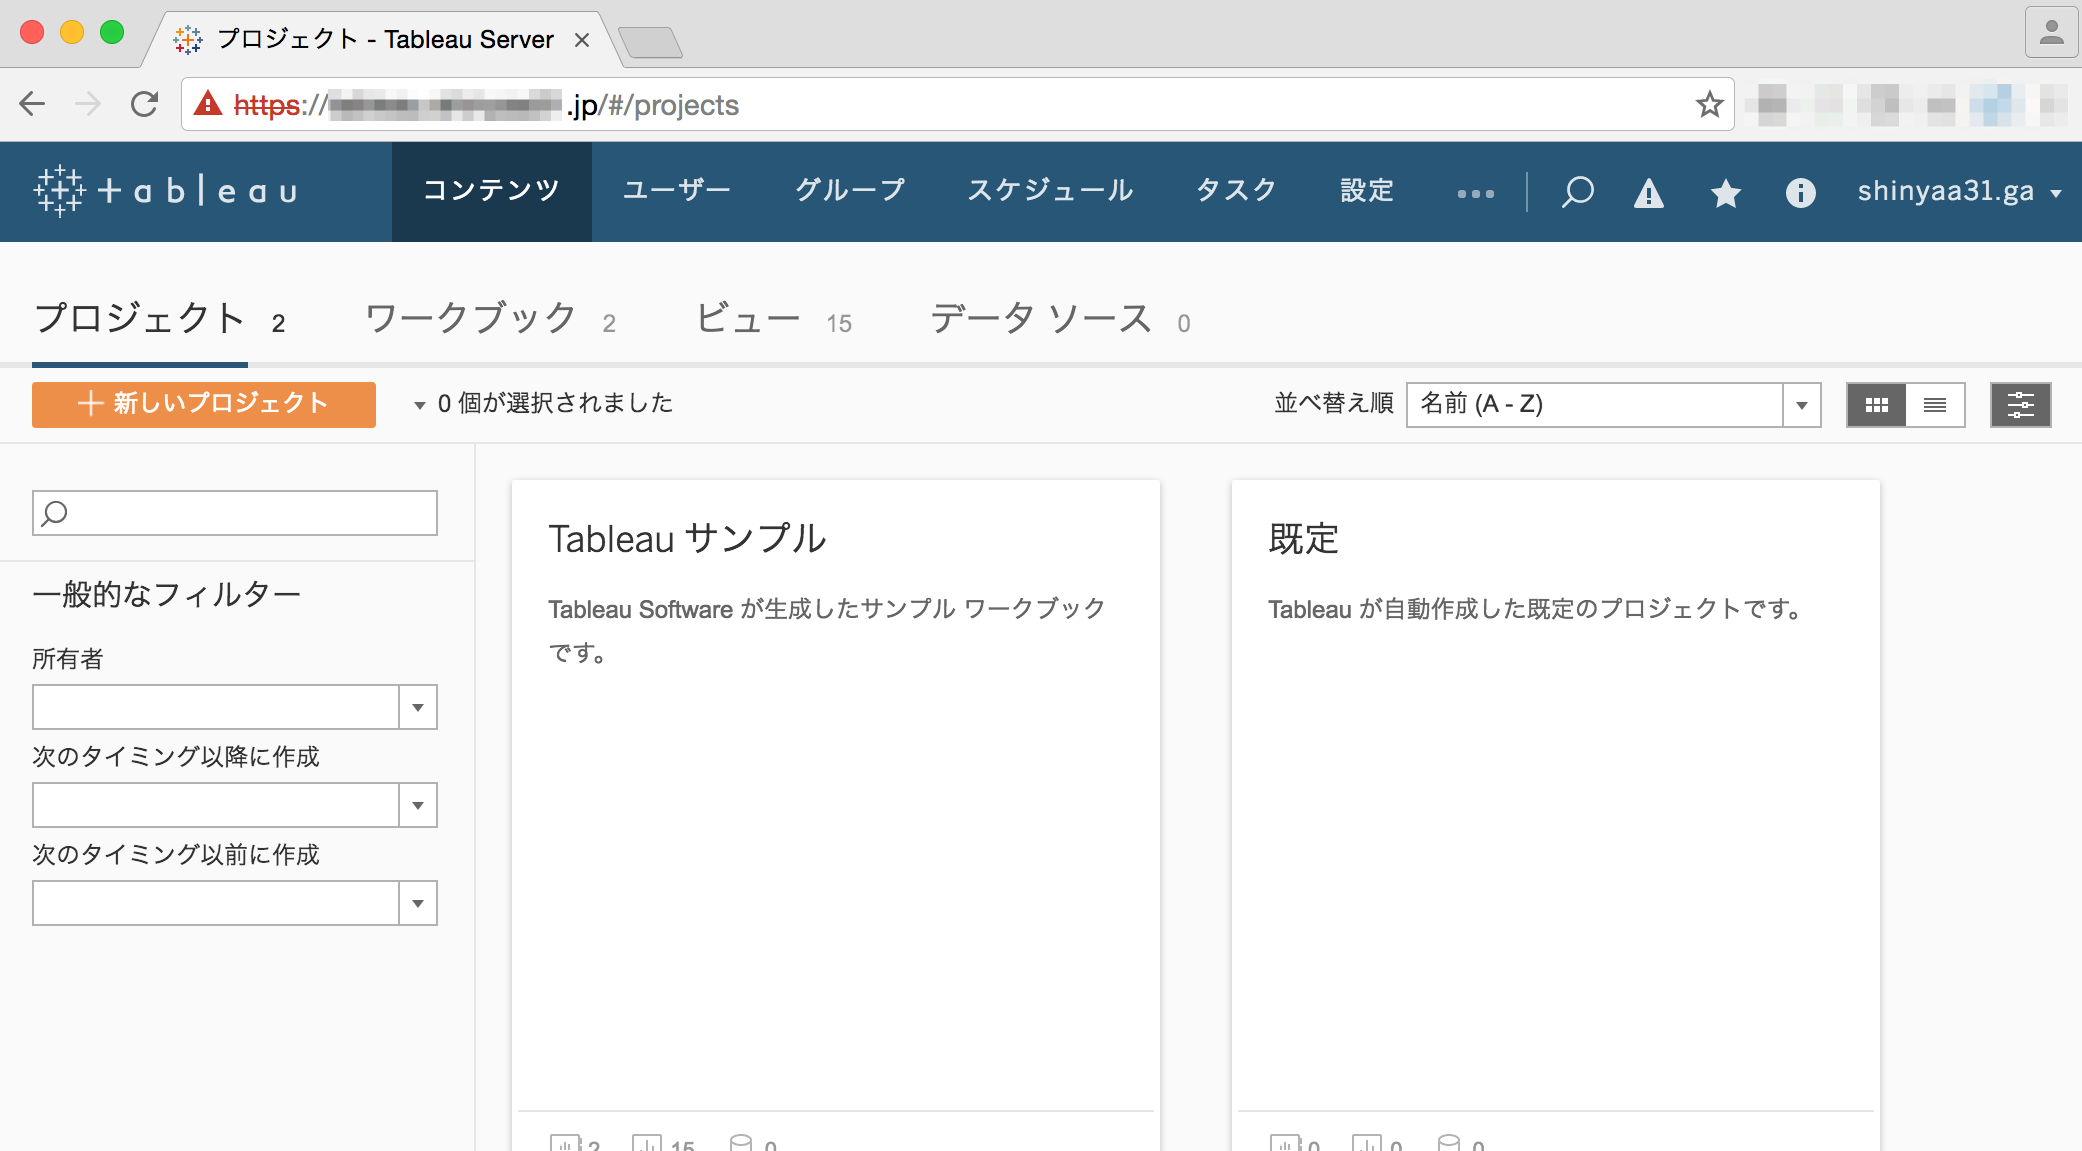 tableau-googleapps-openid-integration_17